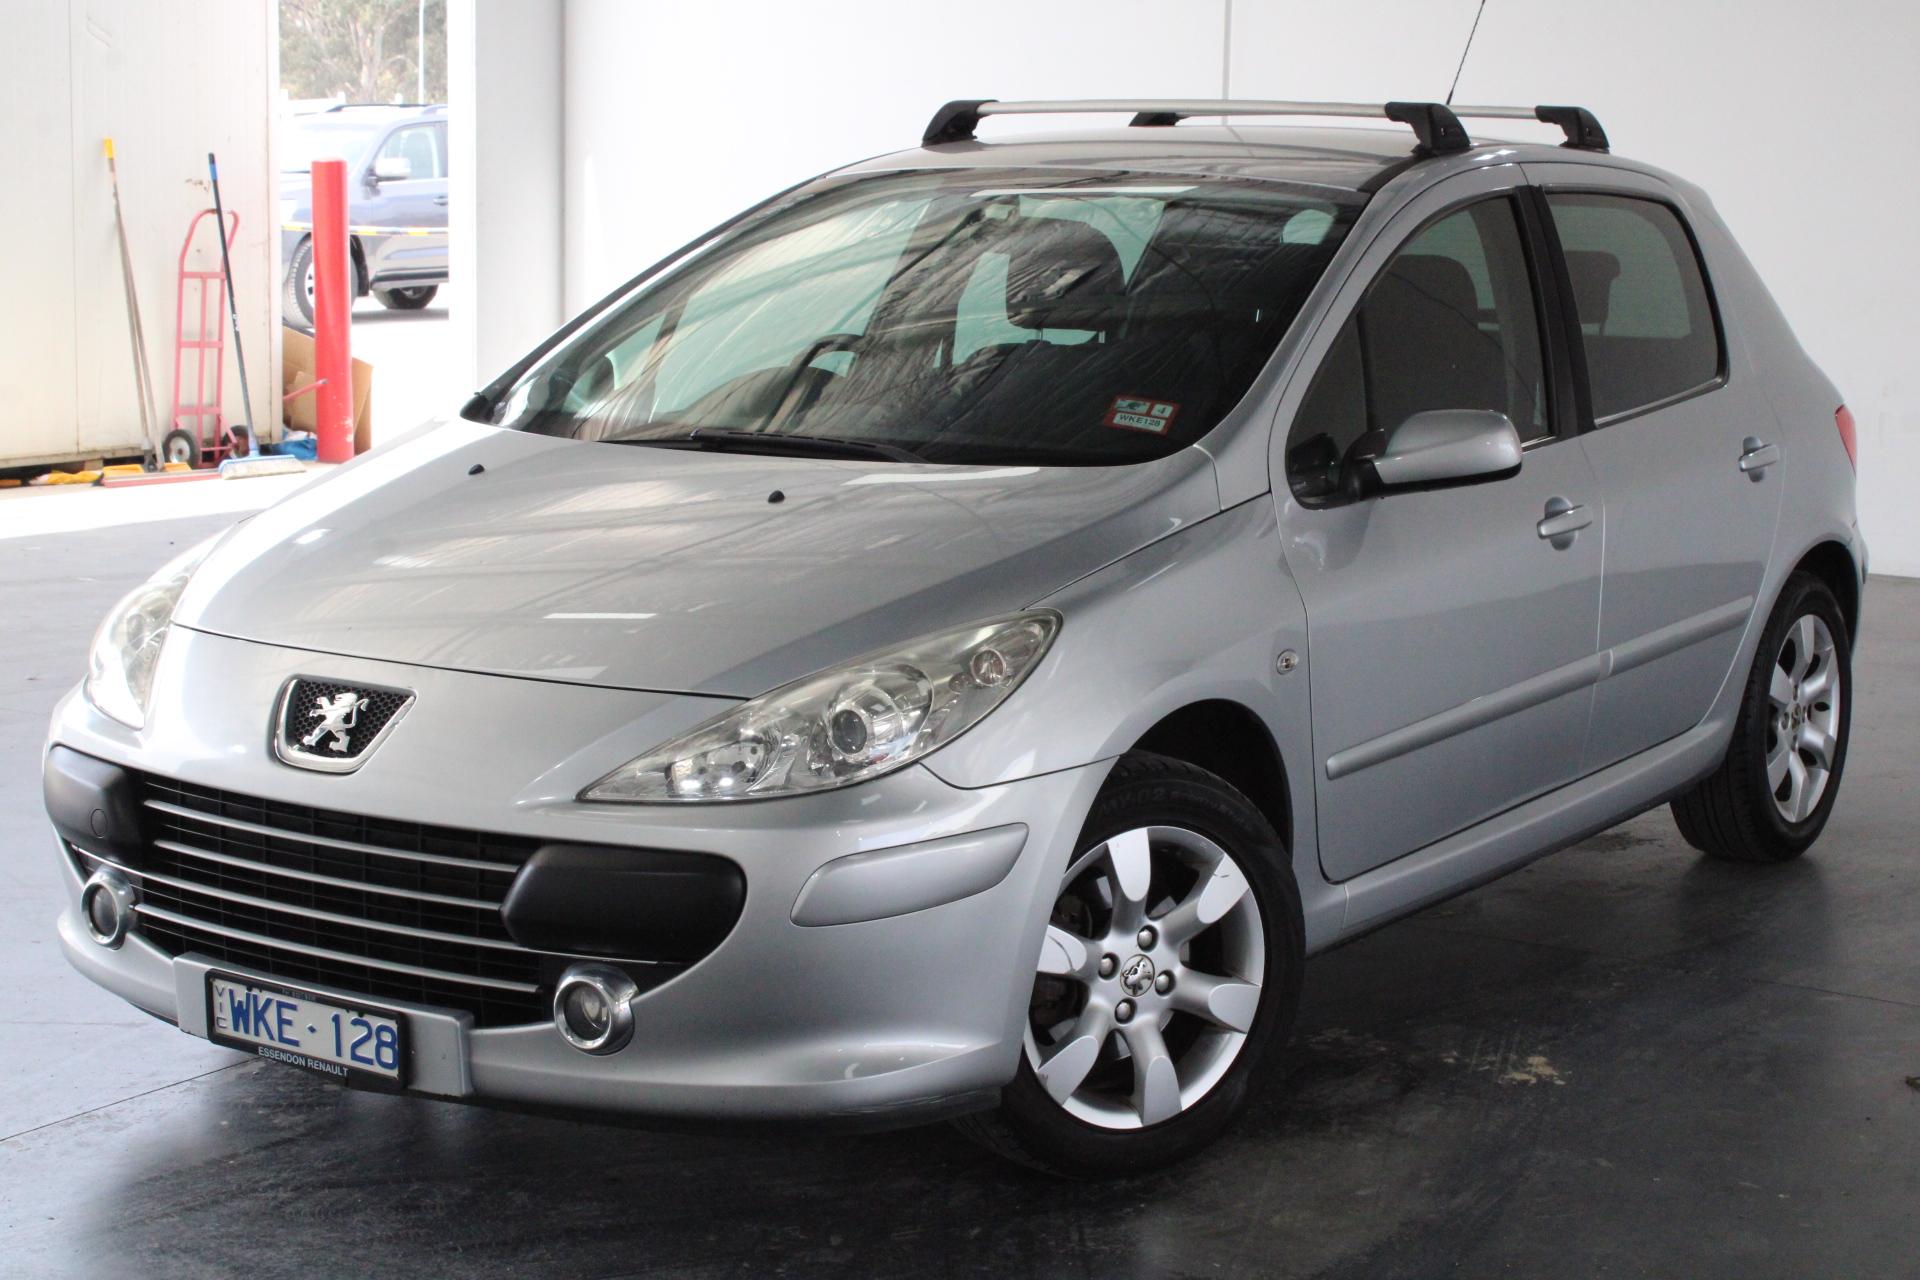 2007 Peugeot 307 XS HDI 1.6 Turbo Diesel Manual Hatchback